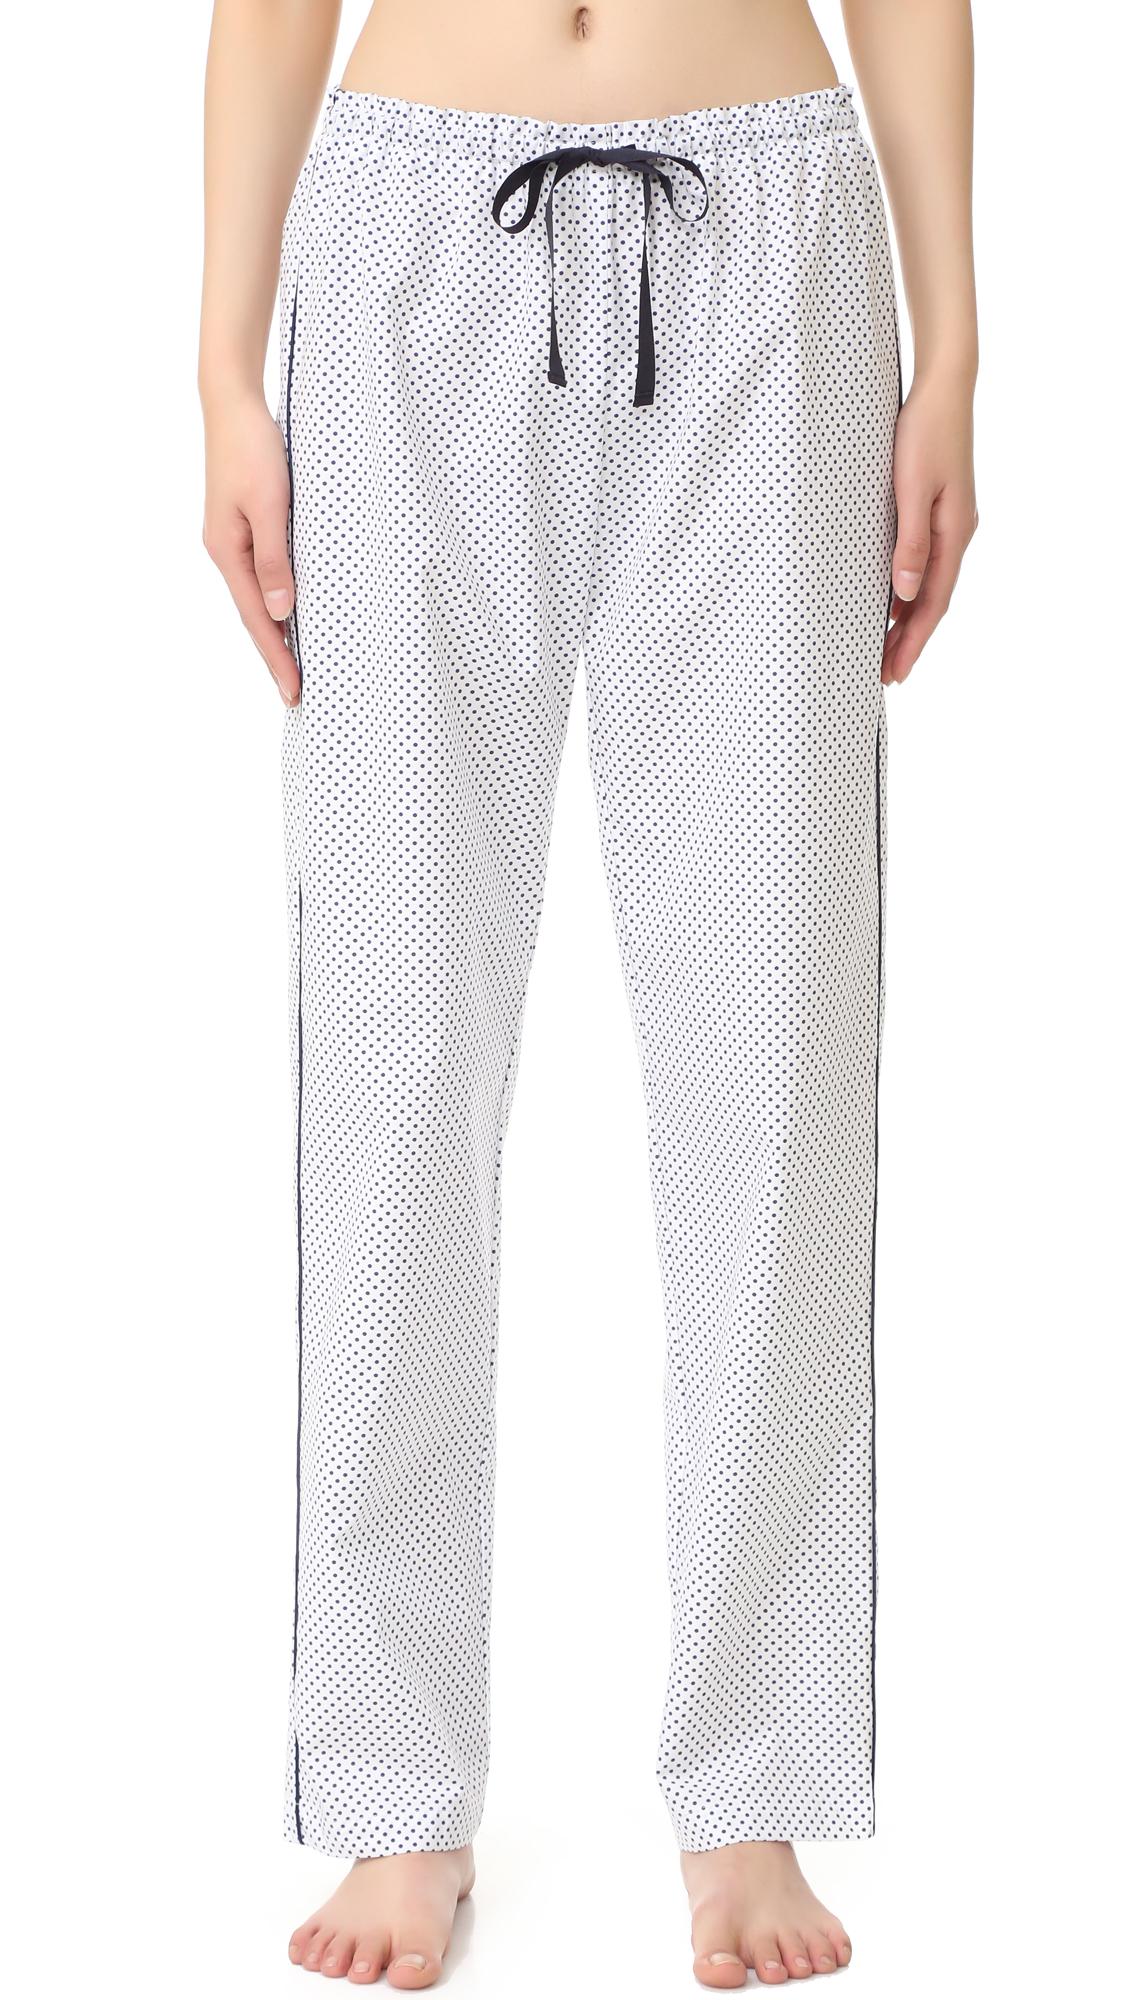 Alessandra Mackenzie Allison Pj Pants - White/Navy Dot at Shopbop